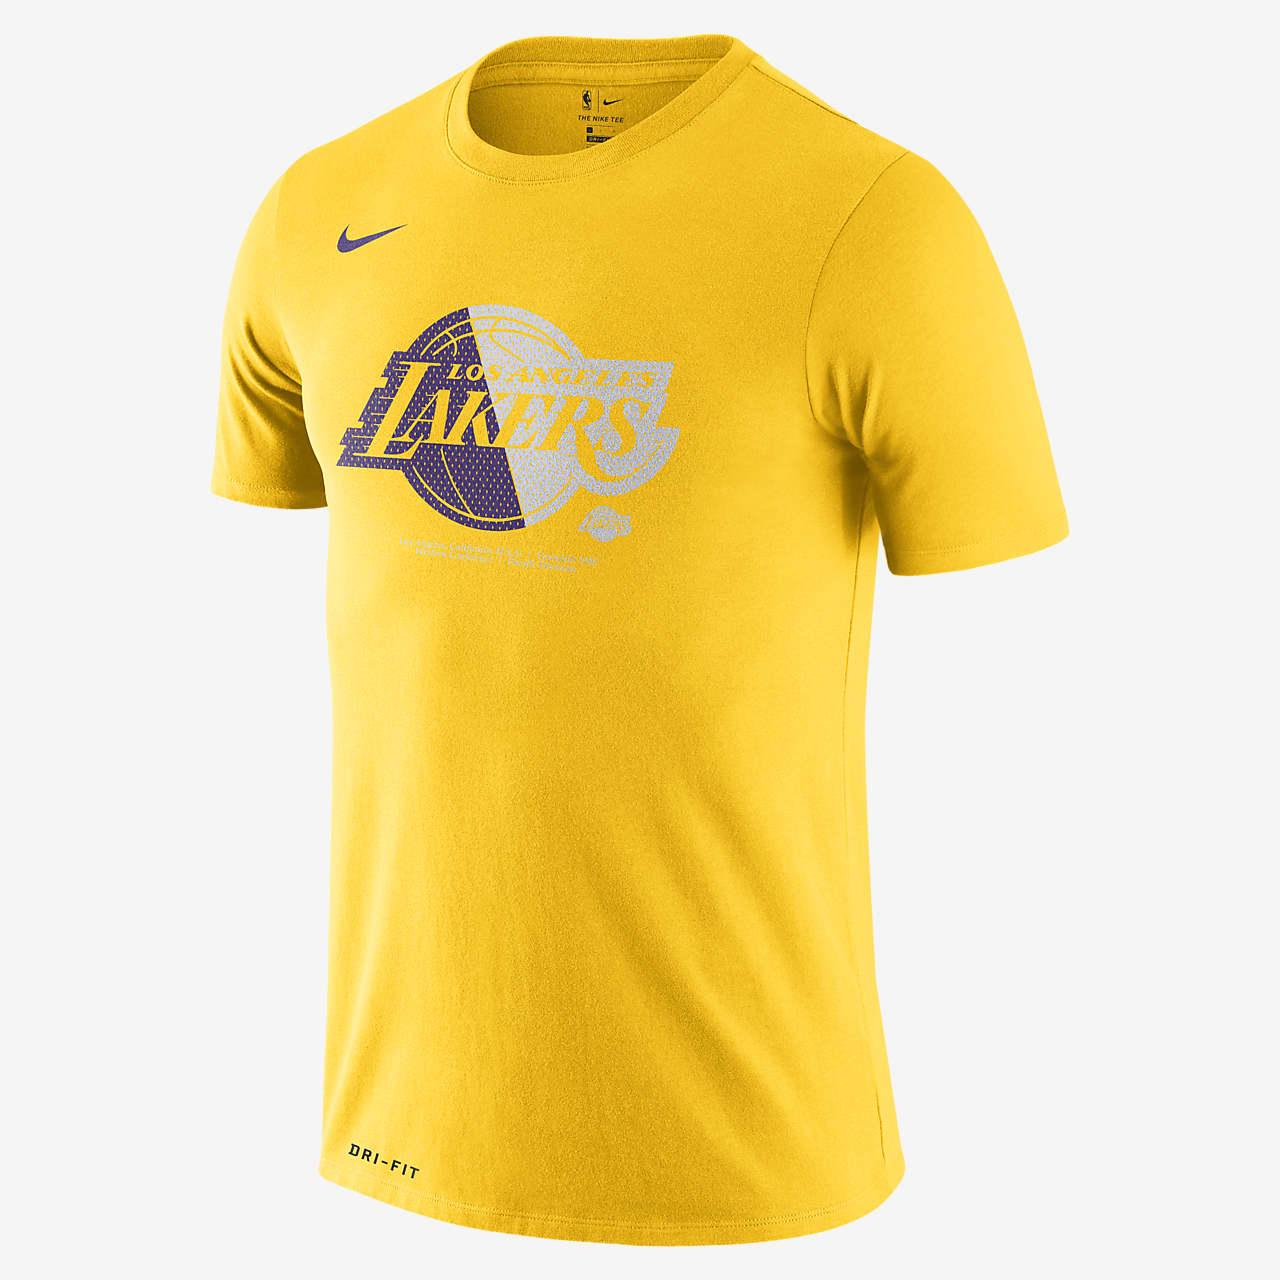 Los Angeles Lakers Nike Dri-FIT Men's